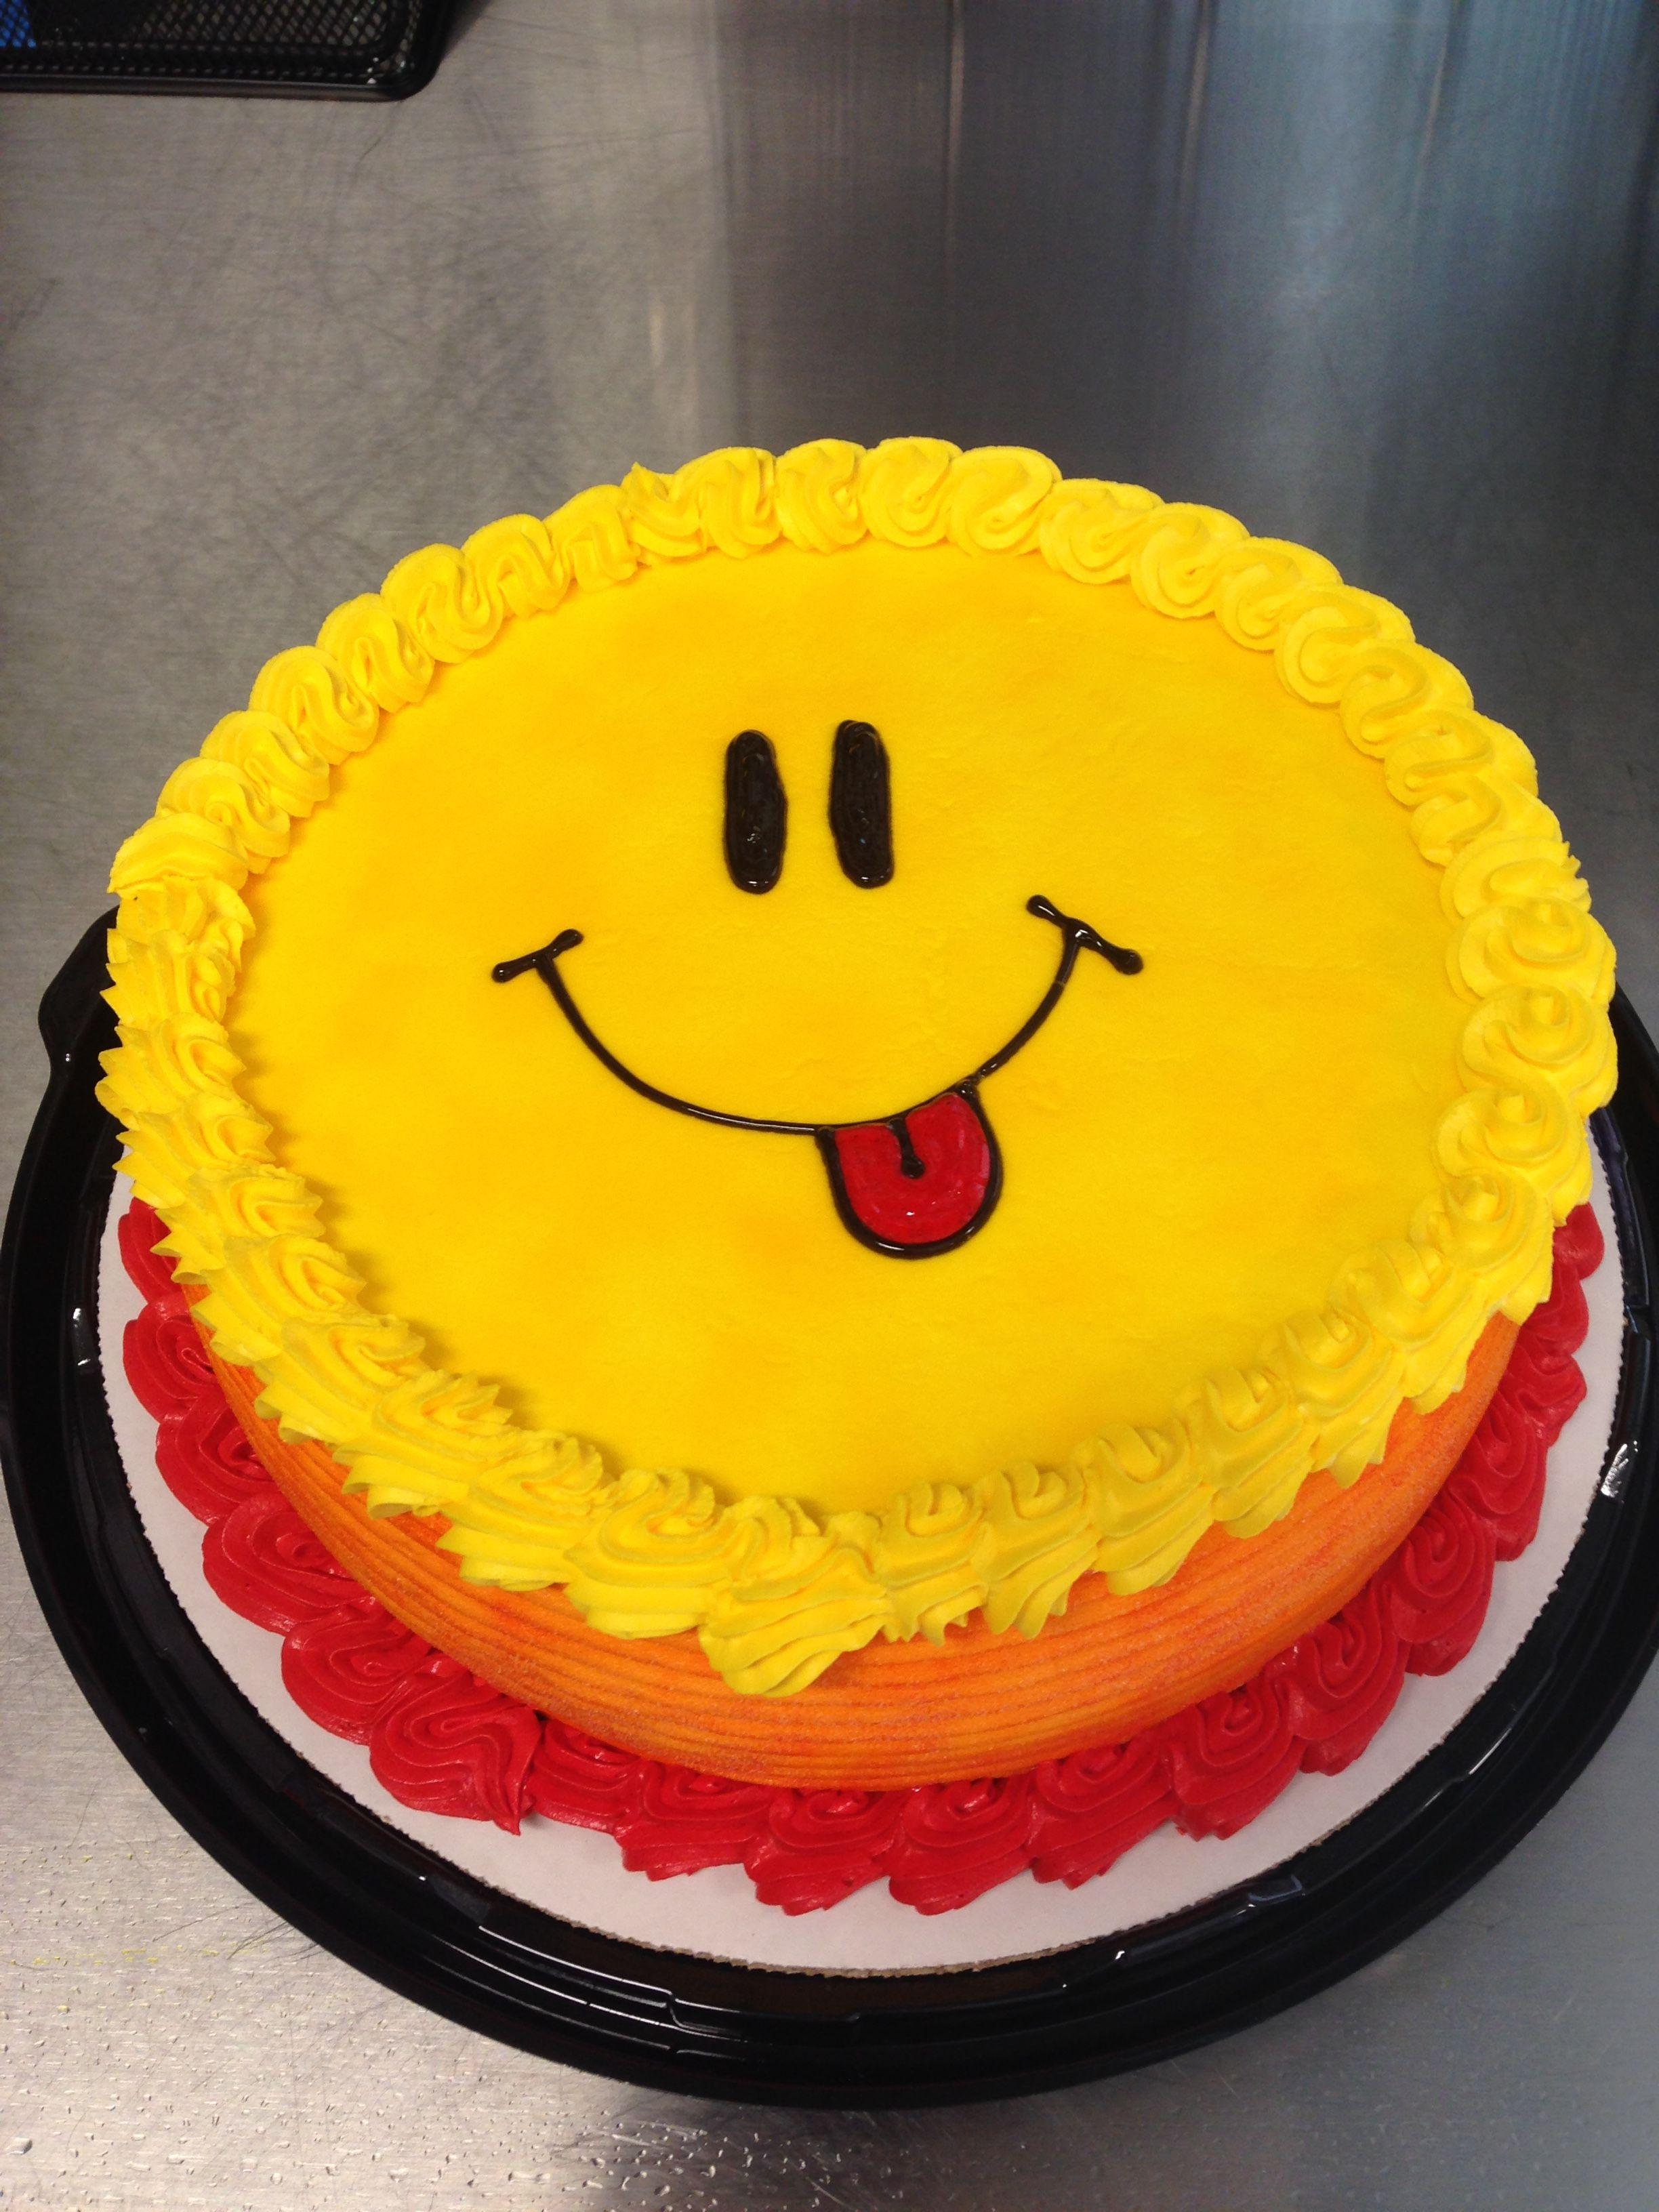 Dq ice cream cake smiley face my cakes pinterest